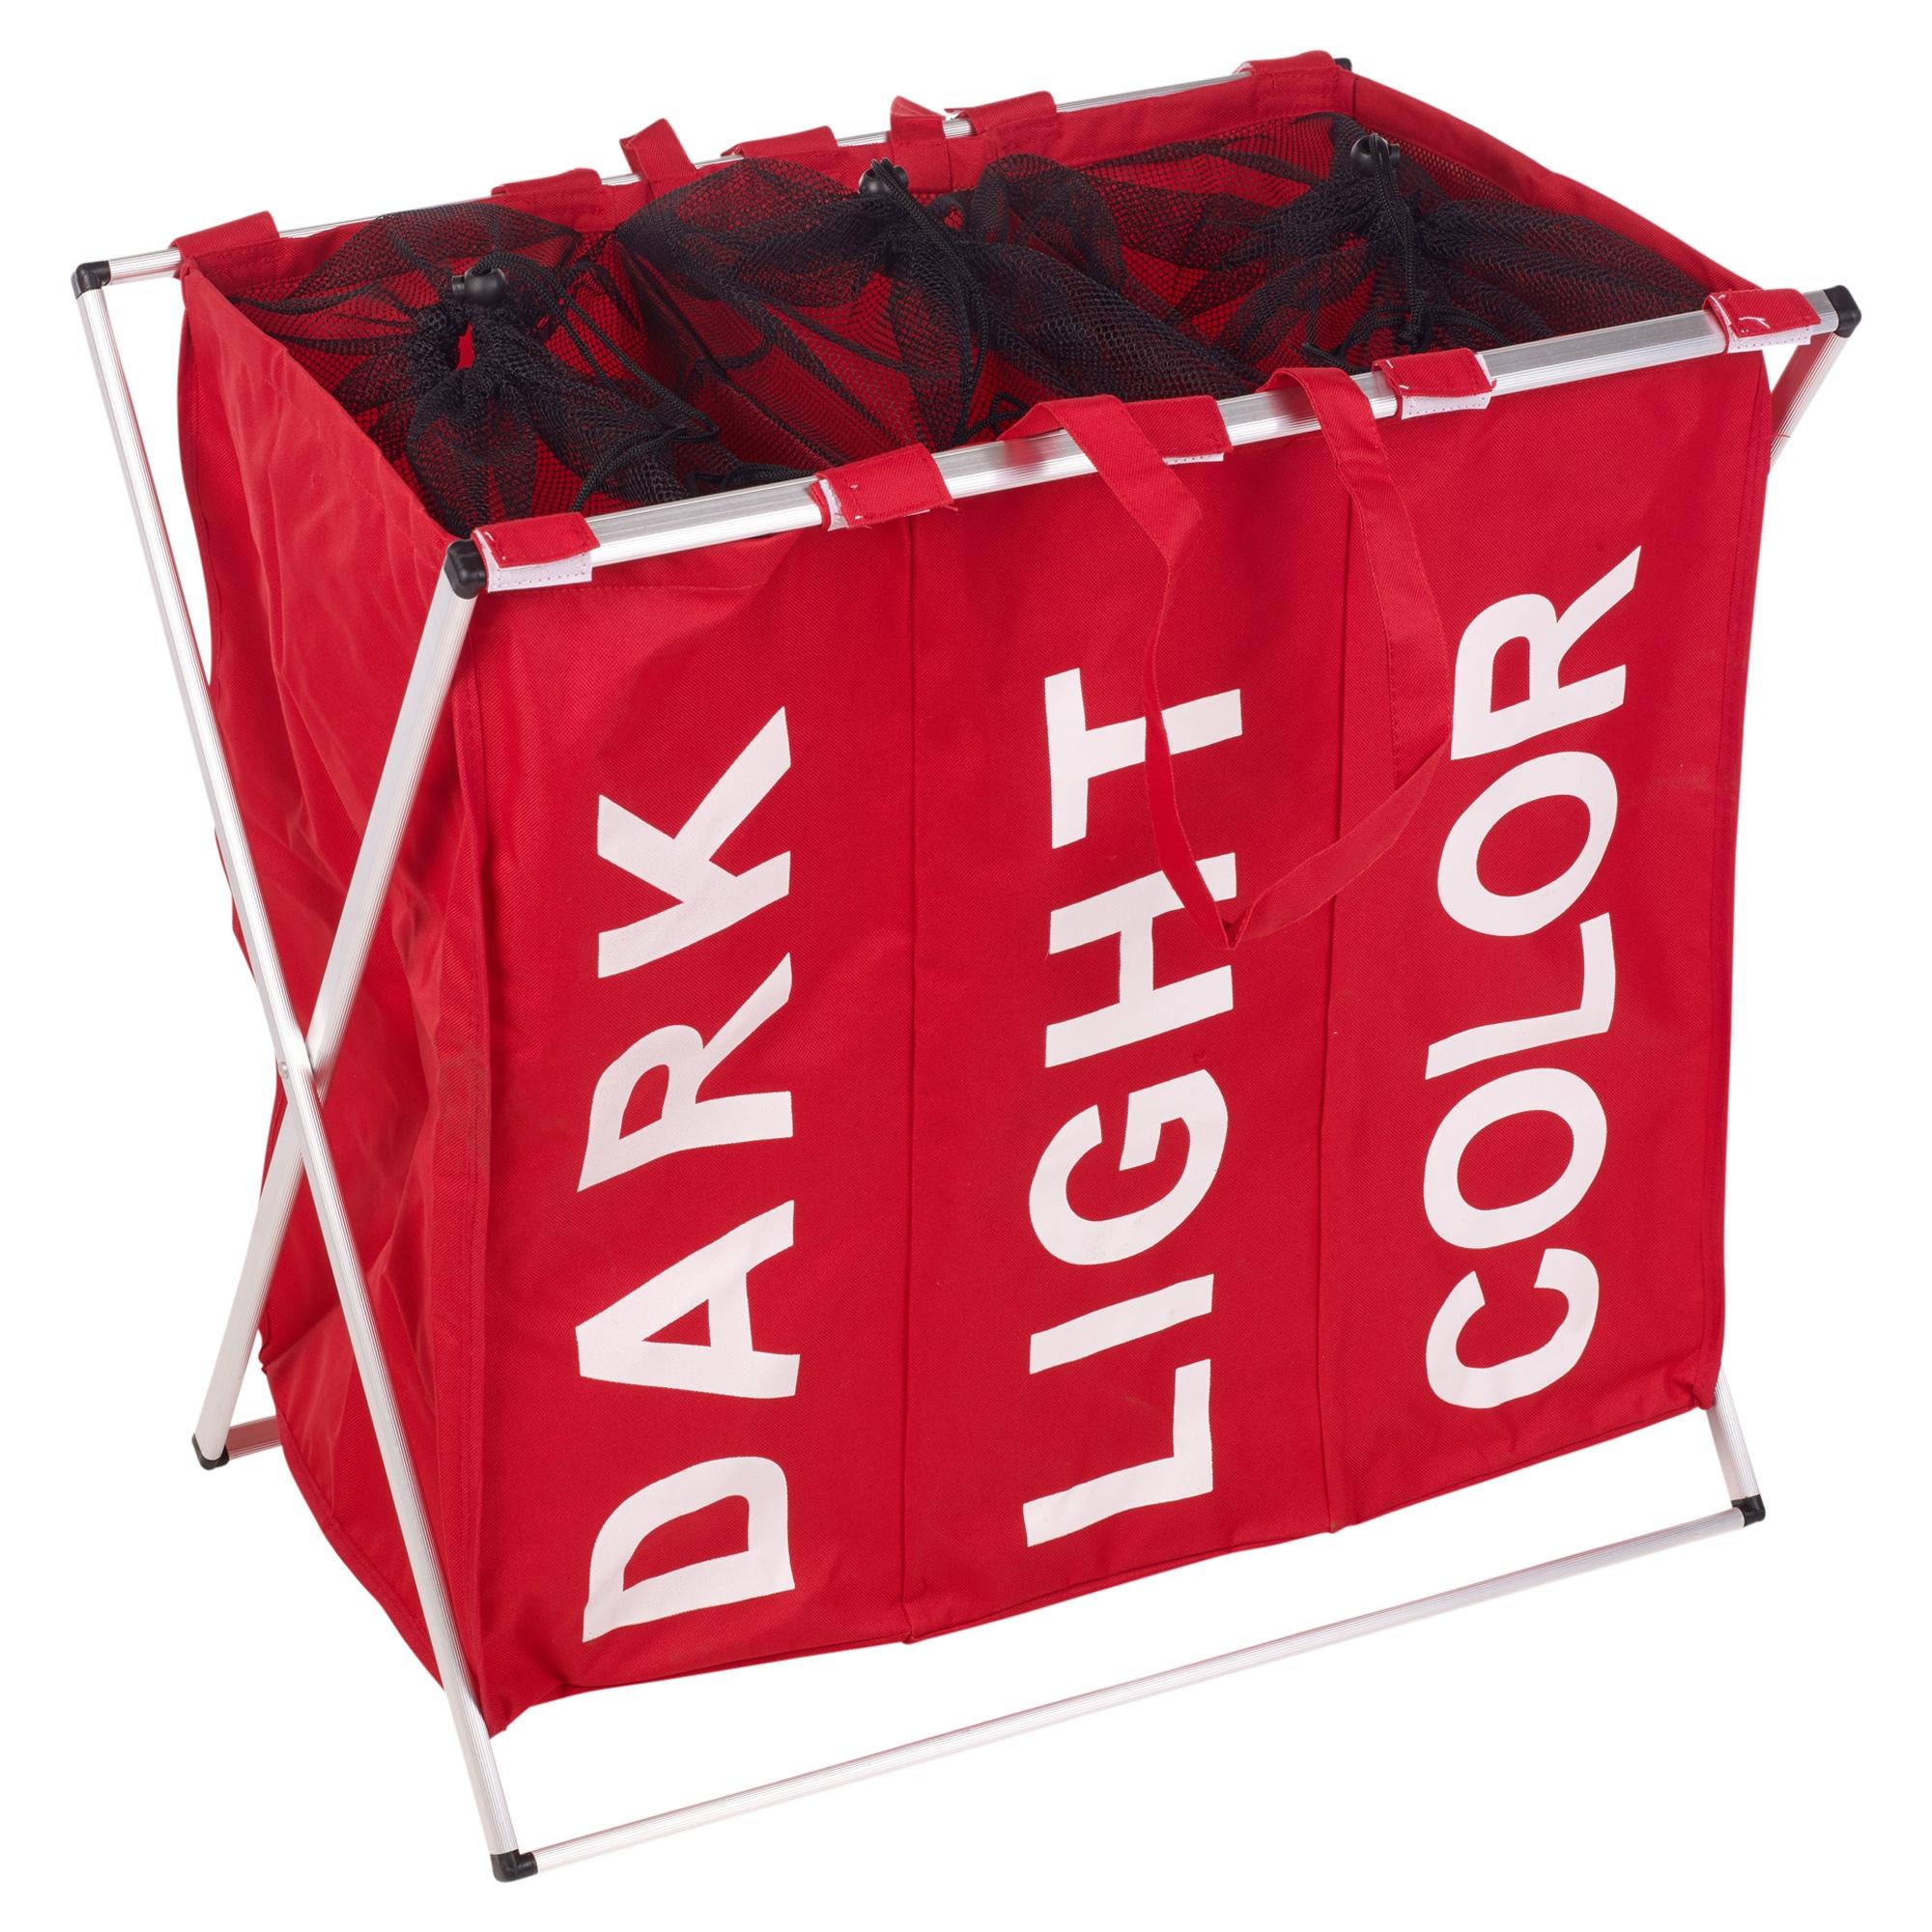 Large 3 section laundry washing clothes basket hamper sorter folding organiser ebay - Laundry basket lights darks colours ...